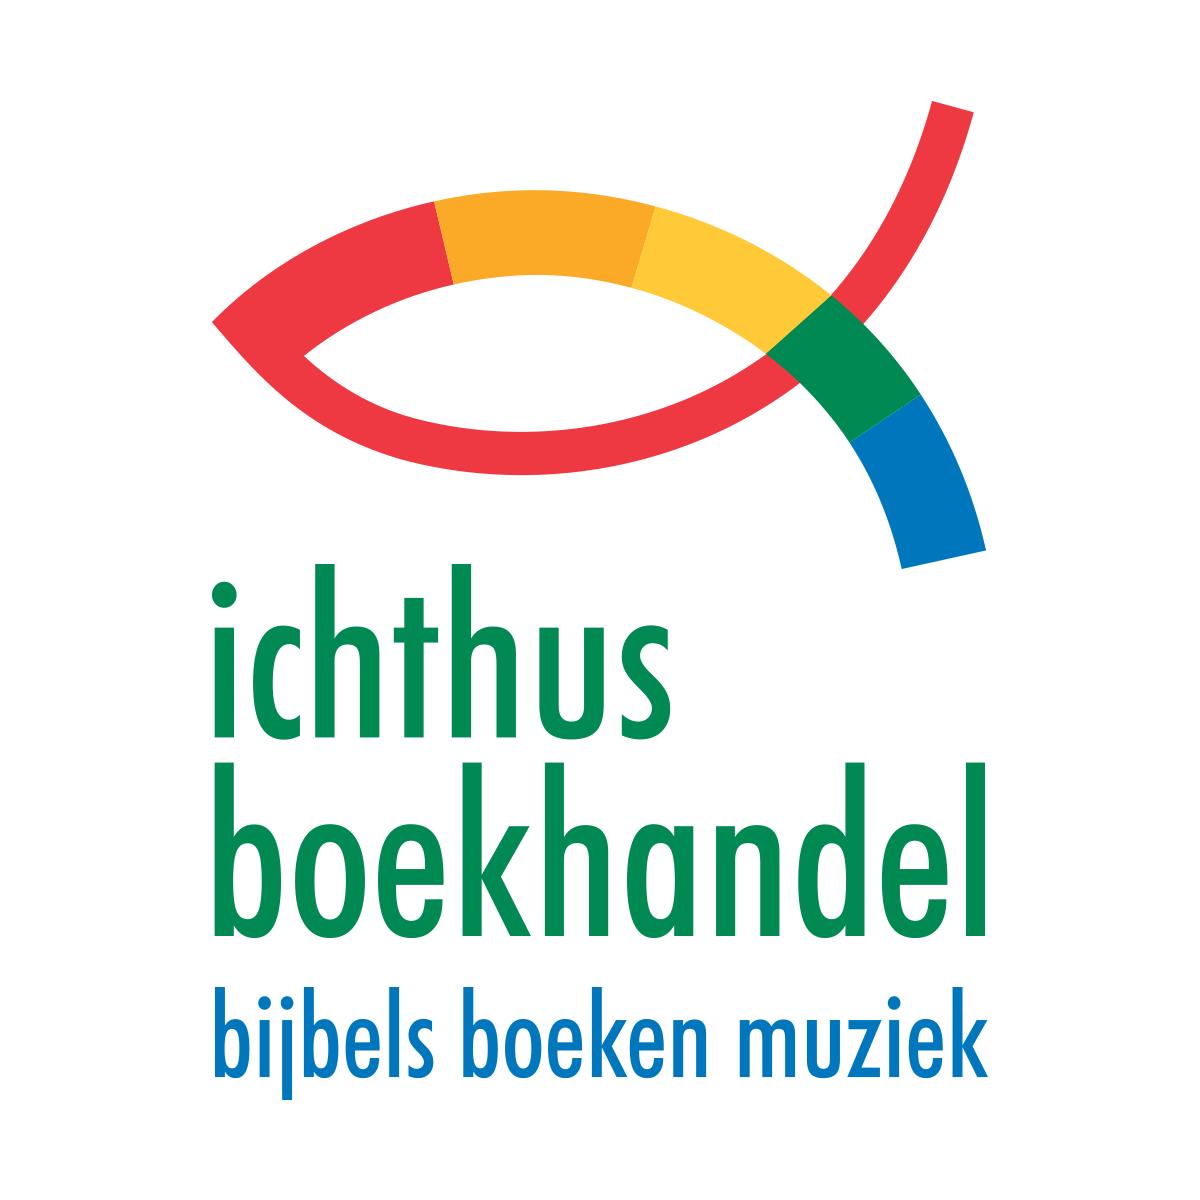 christelijke boekhandel rotterdam